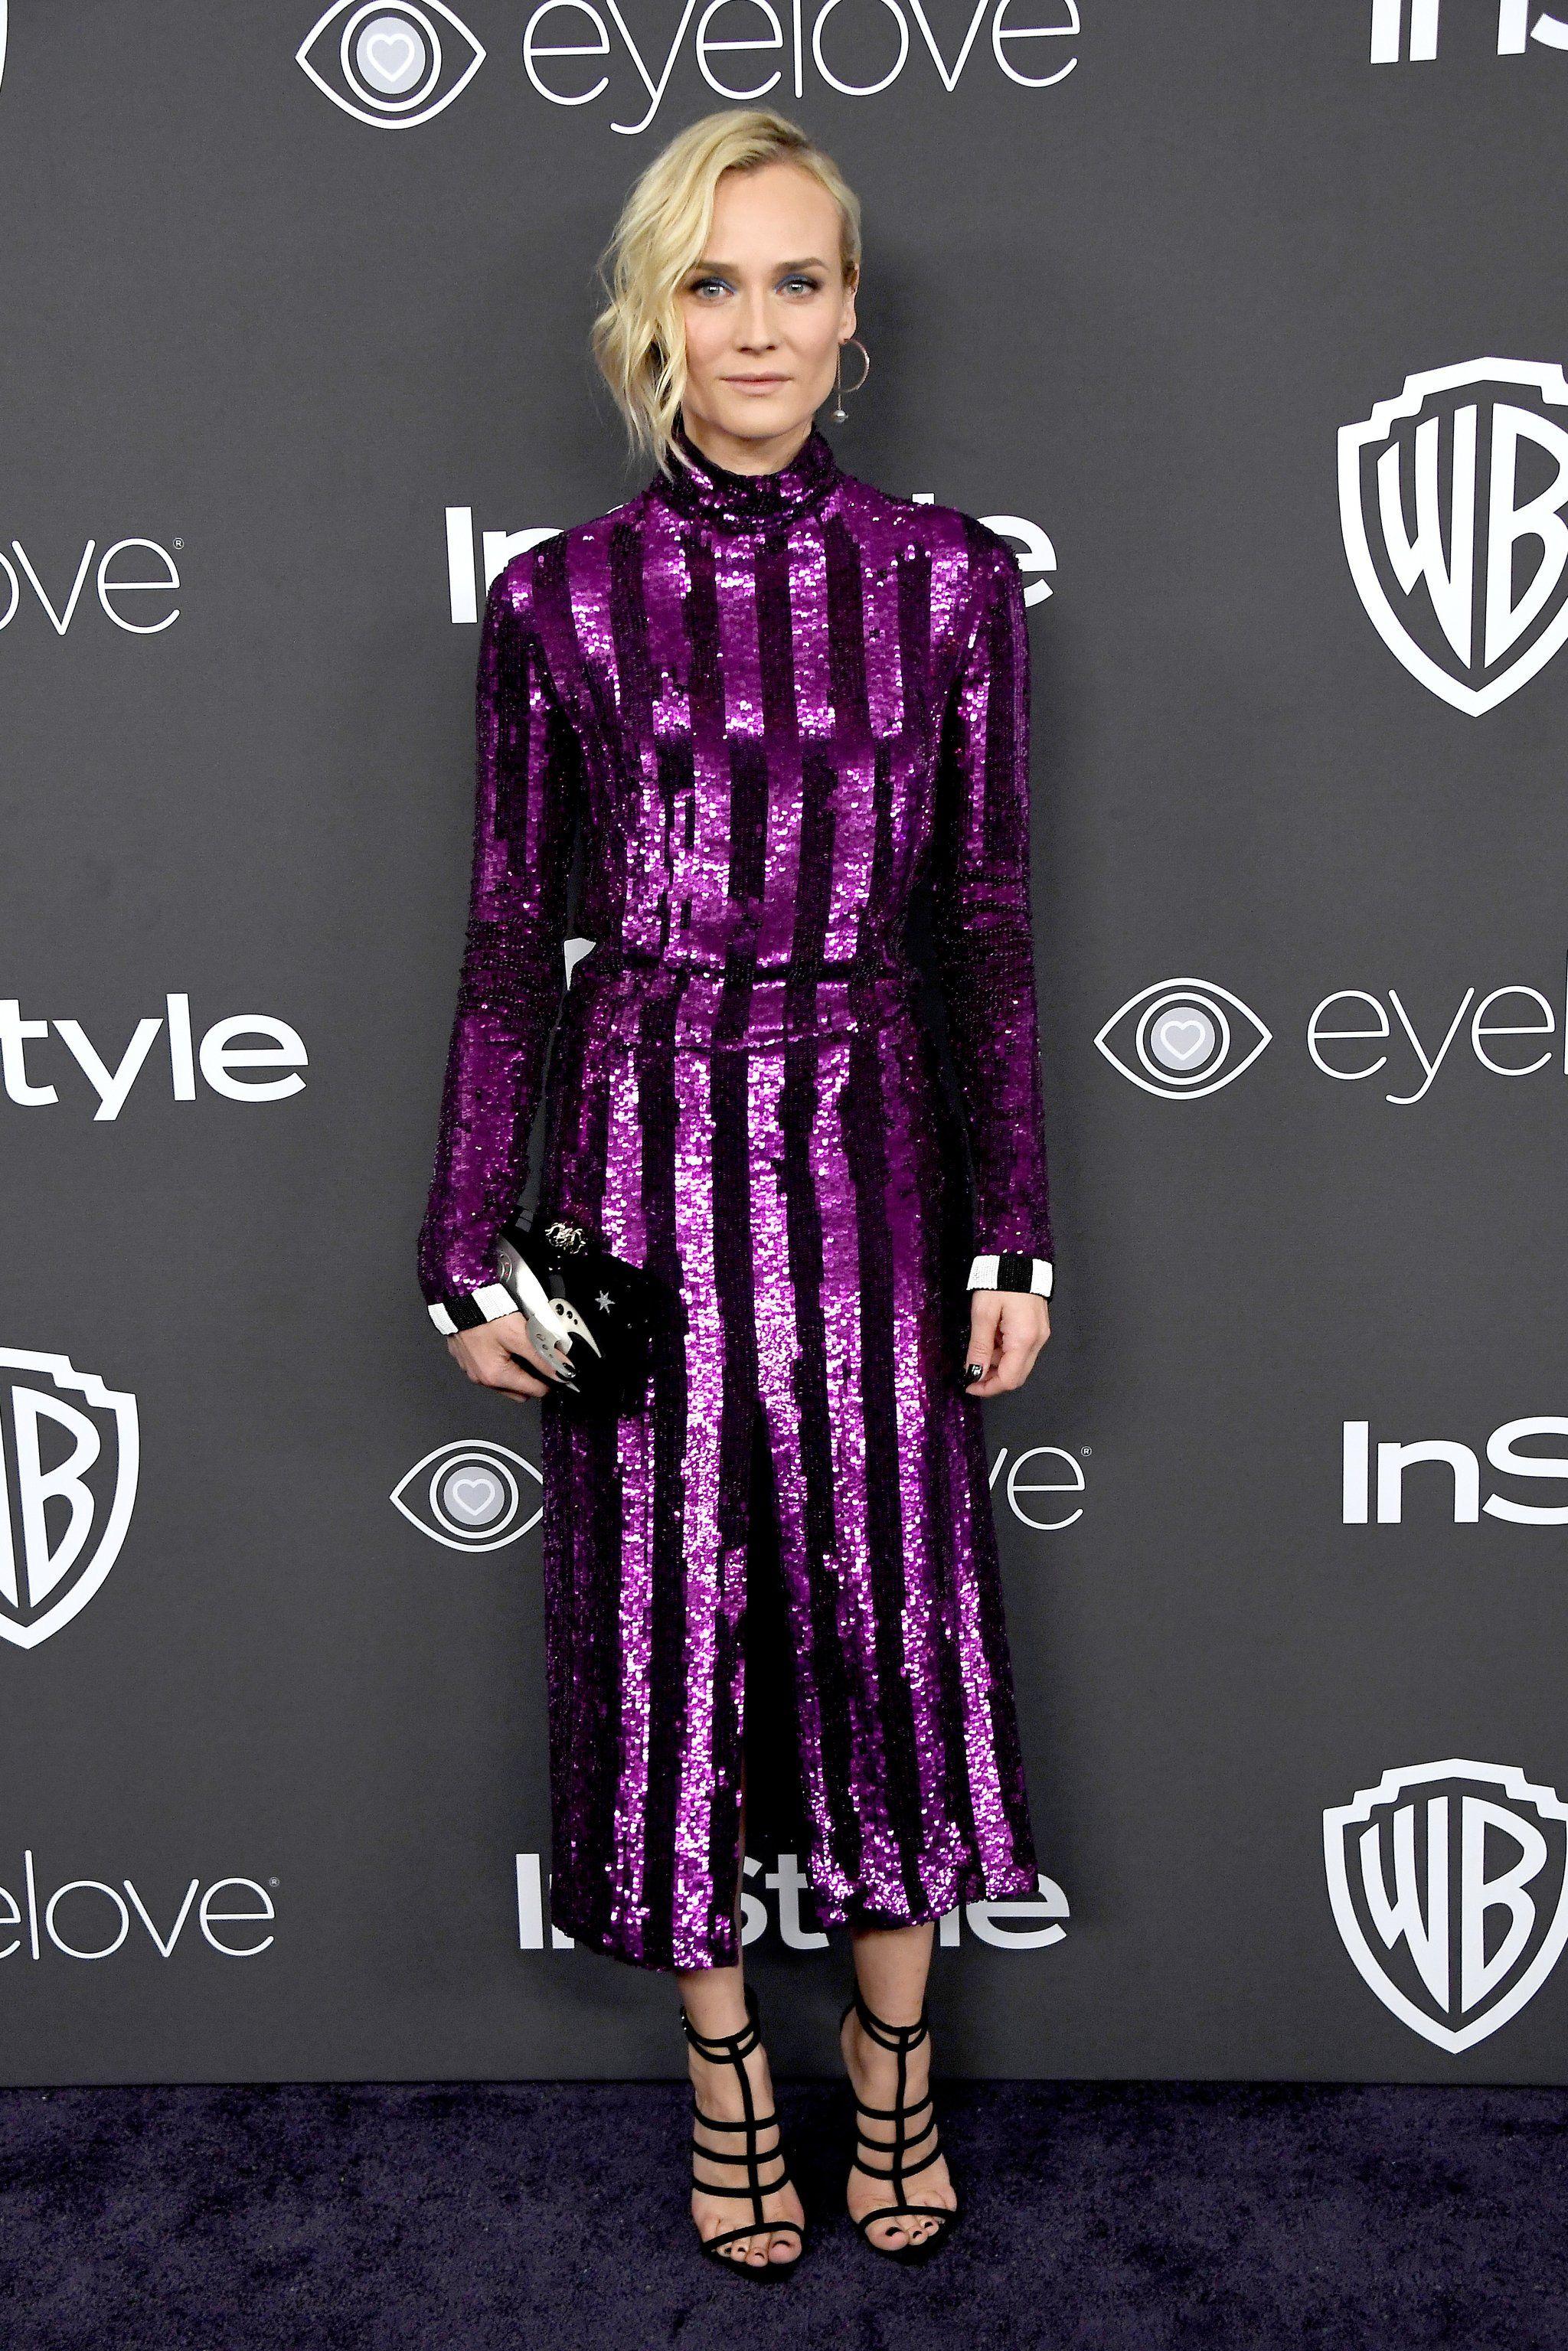 Diane Kruger in a Nina Ricci dress, Giuseppe Zanotti shoes, Charlotte Olympia clutch and Swarovski earrings